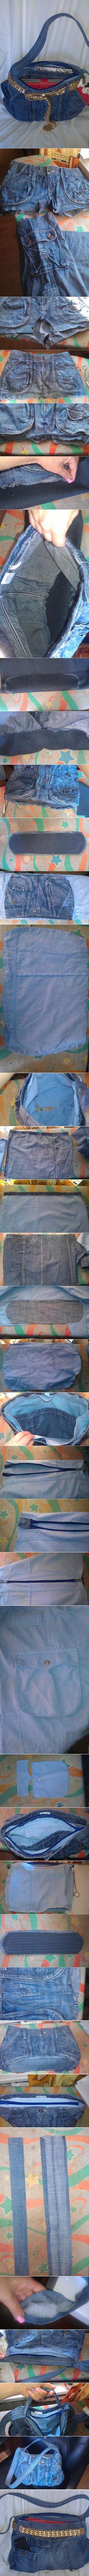 DIY Old Jeans Fashionable Bag